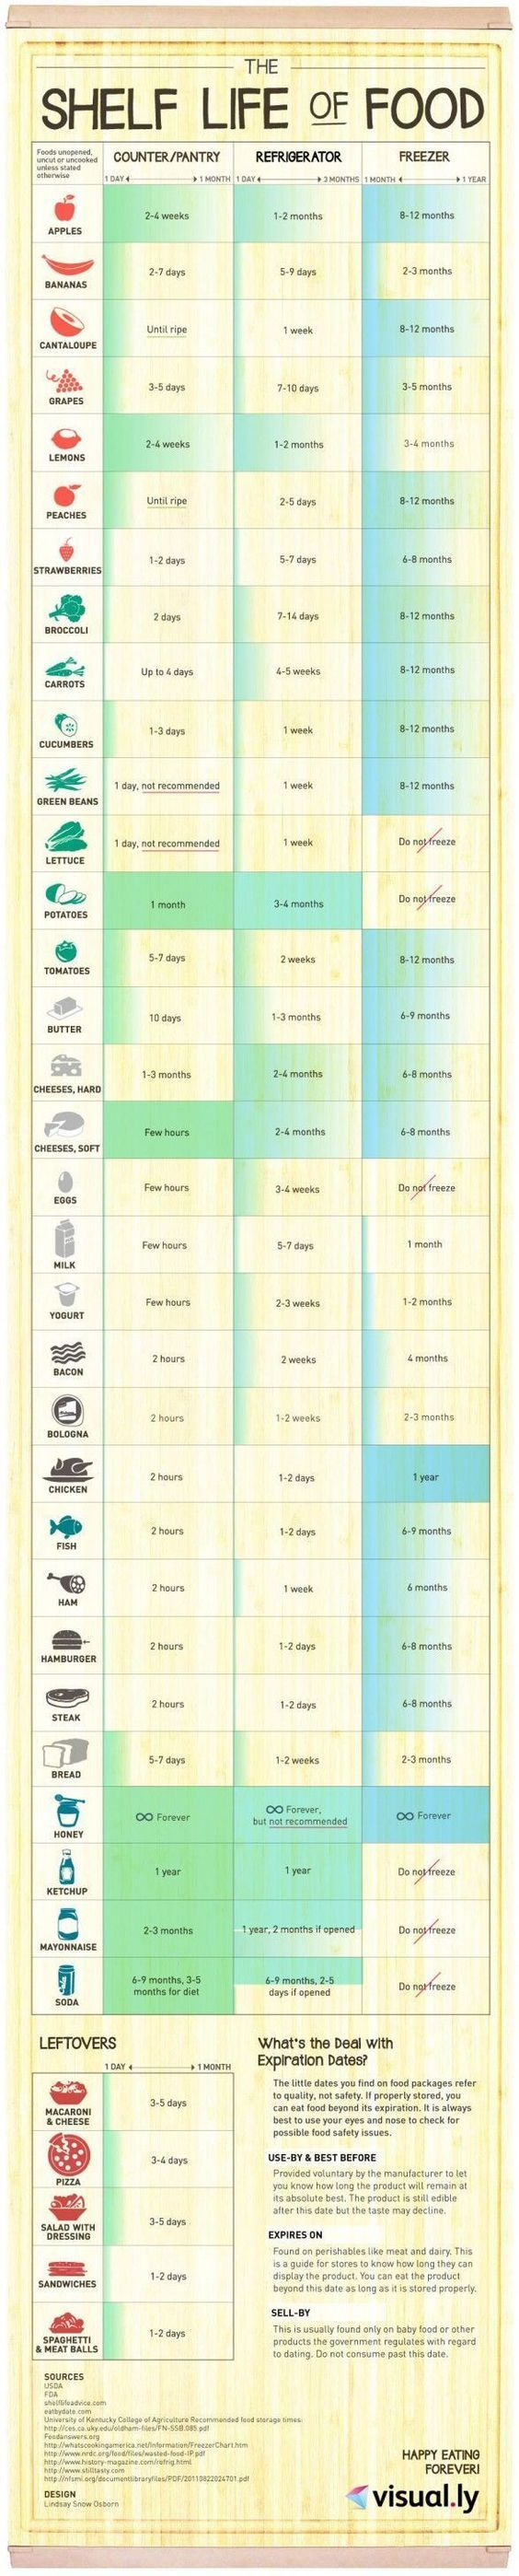 Best Long Term Food Storage Tips